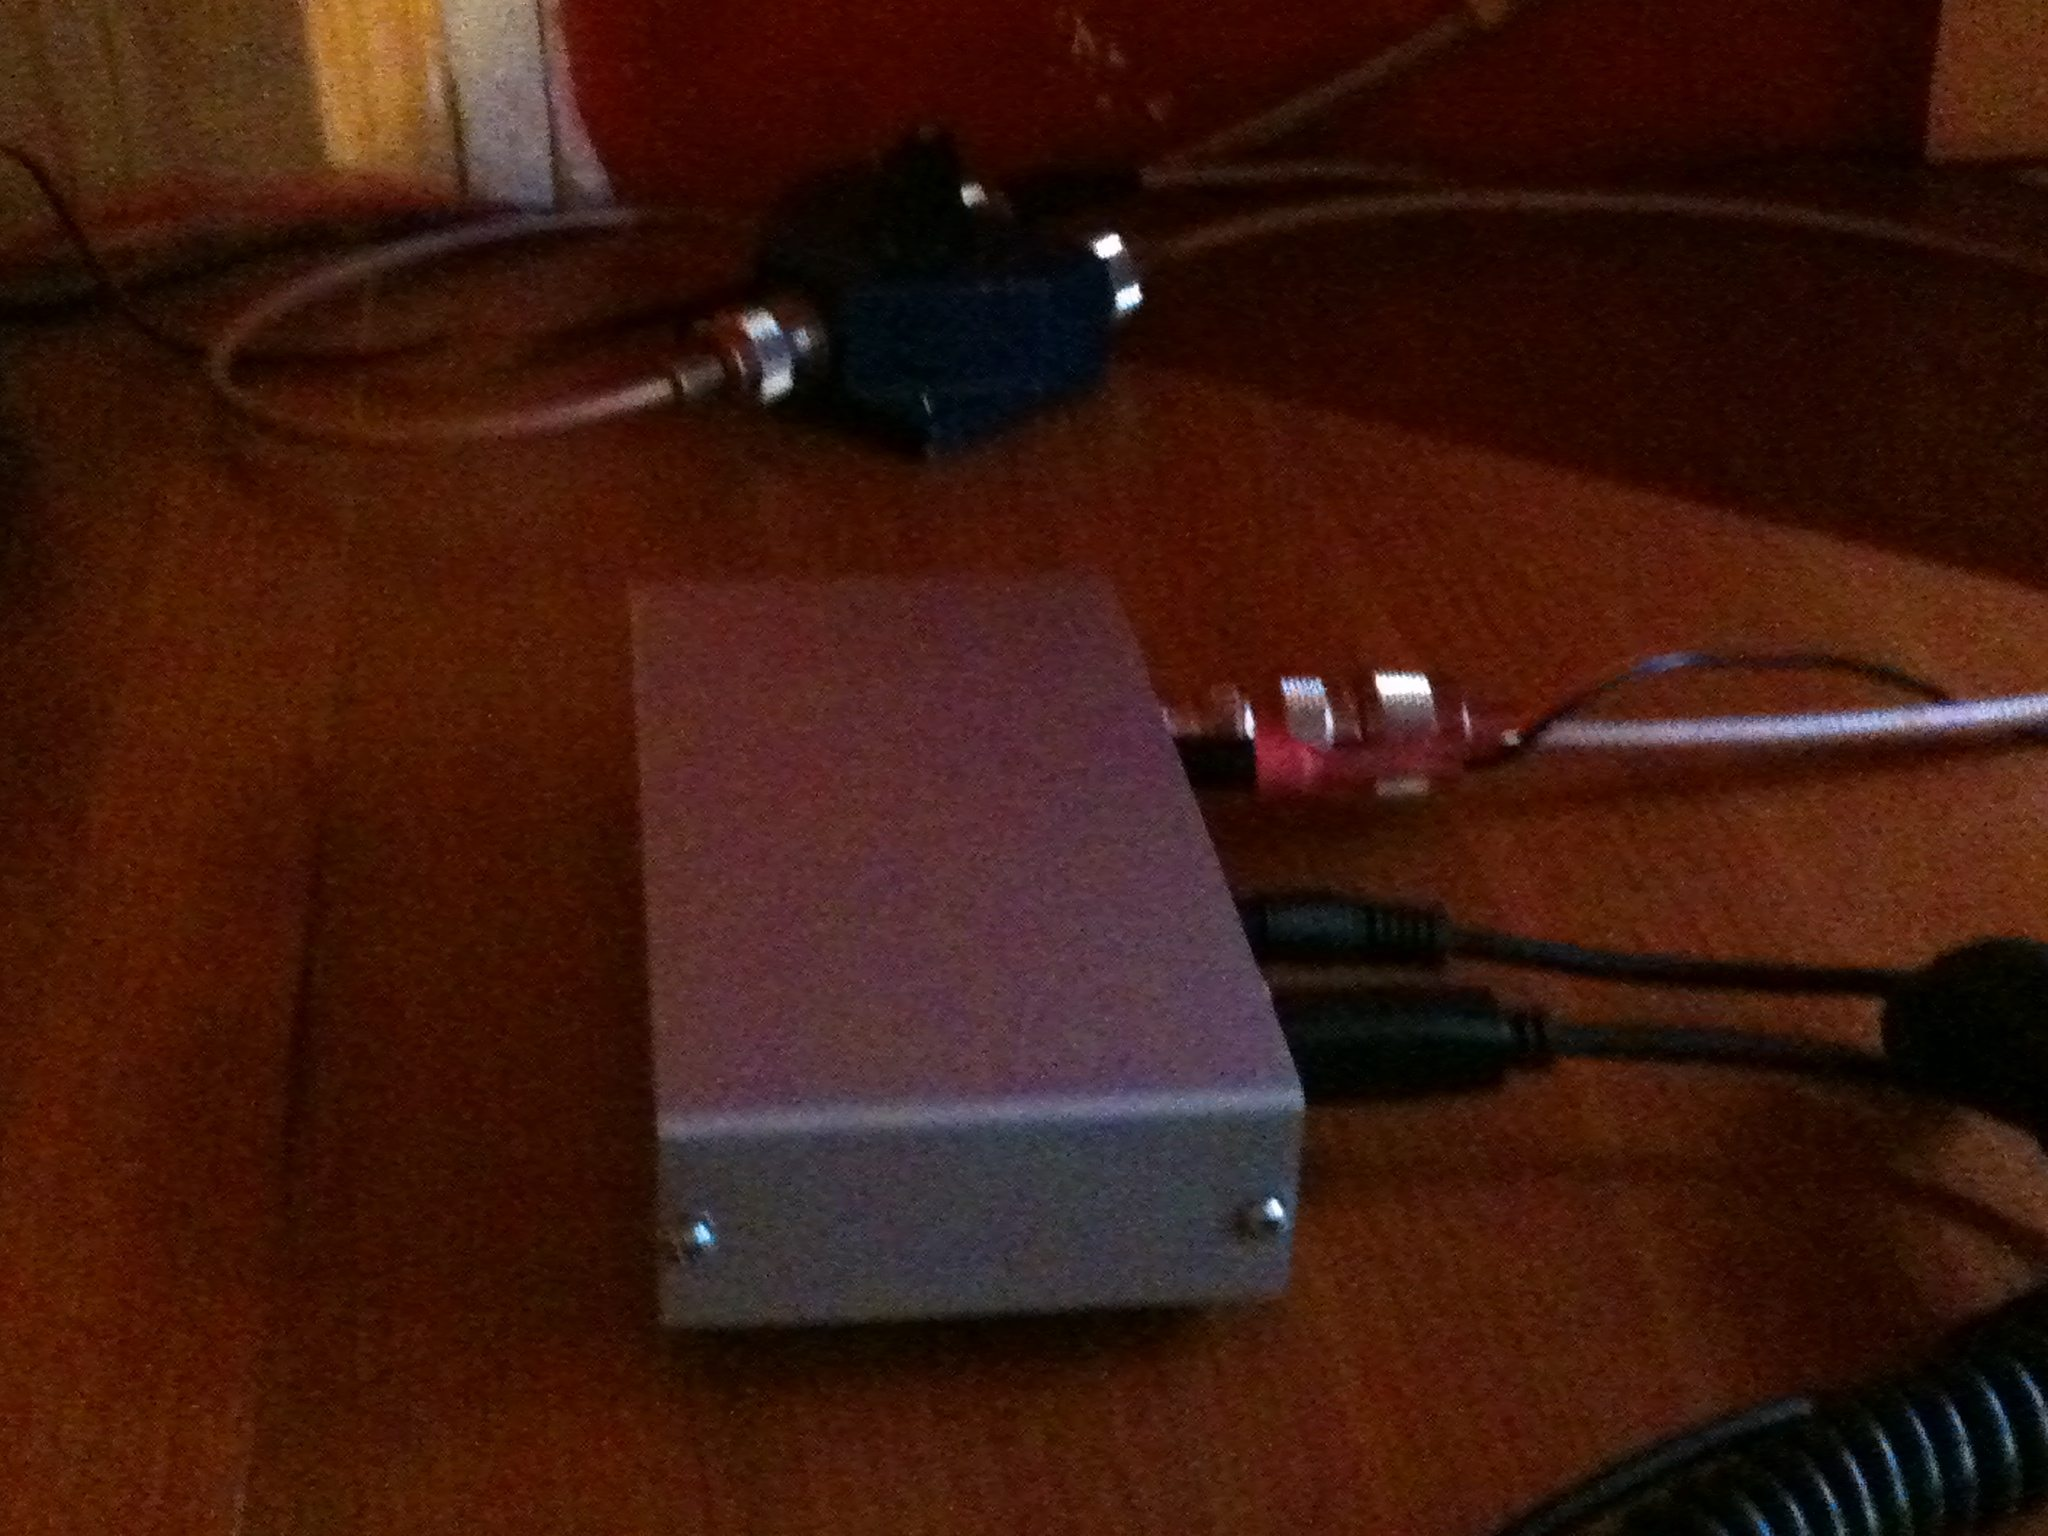 My first Software Defined Radio | Francesco IZ7KHR